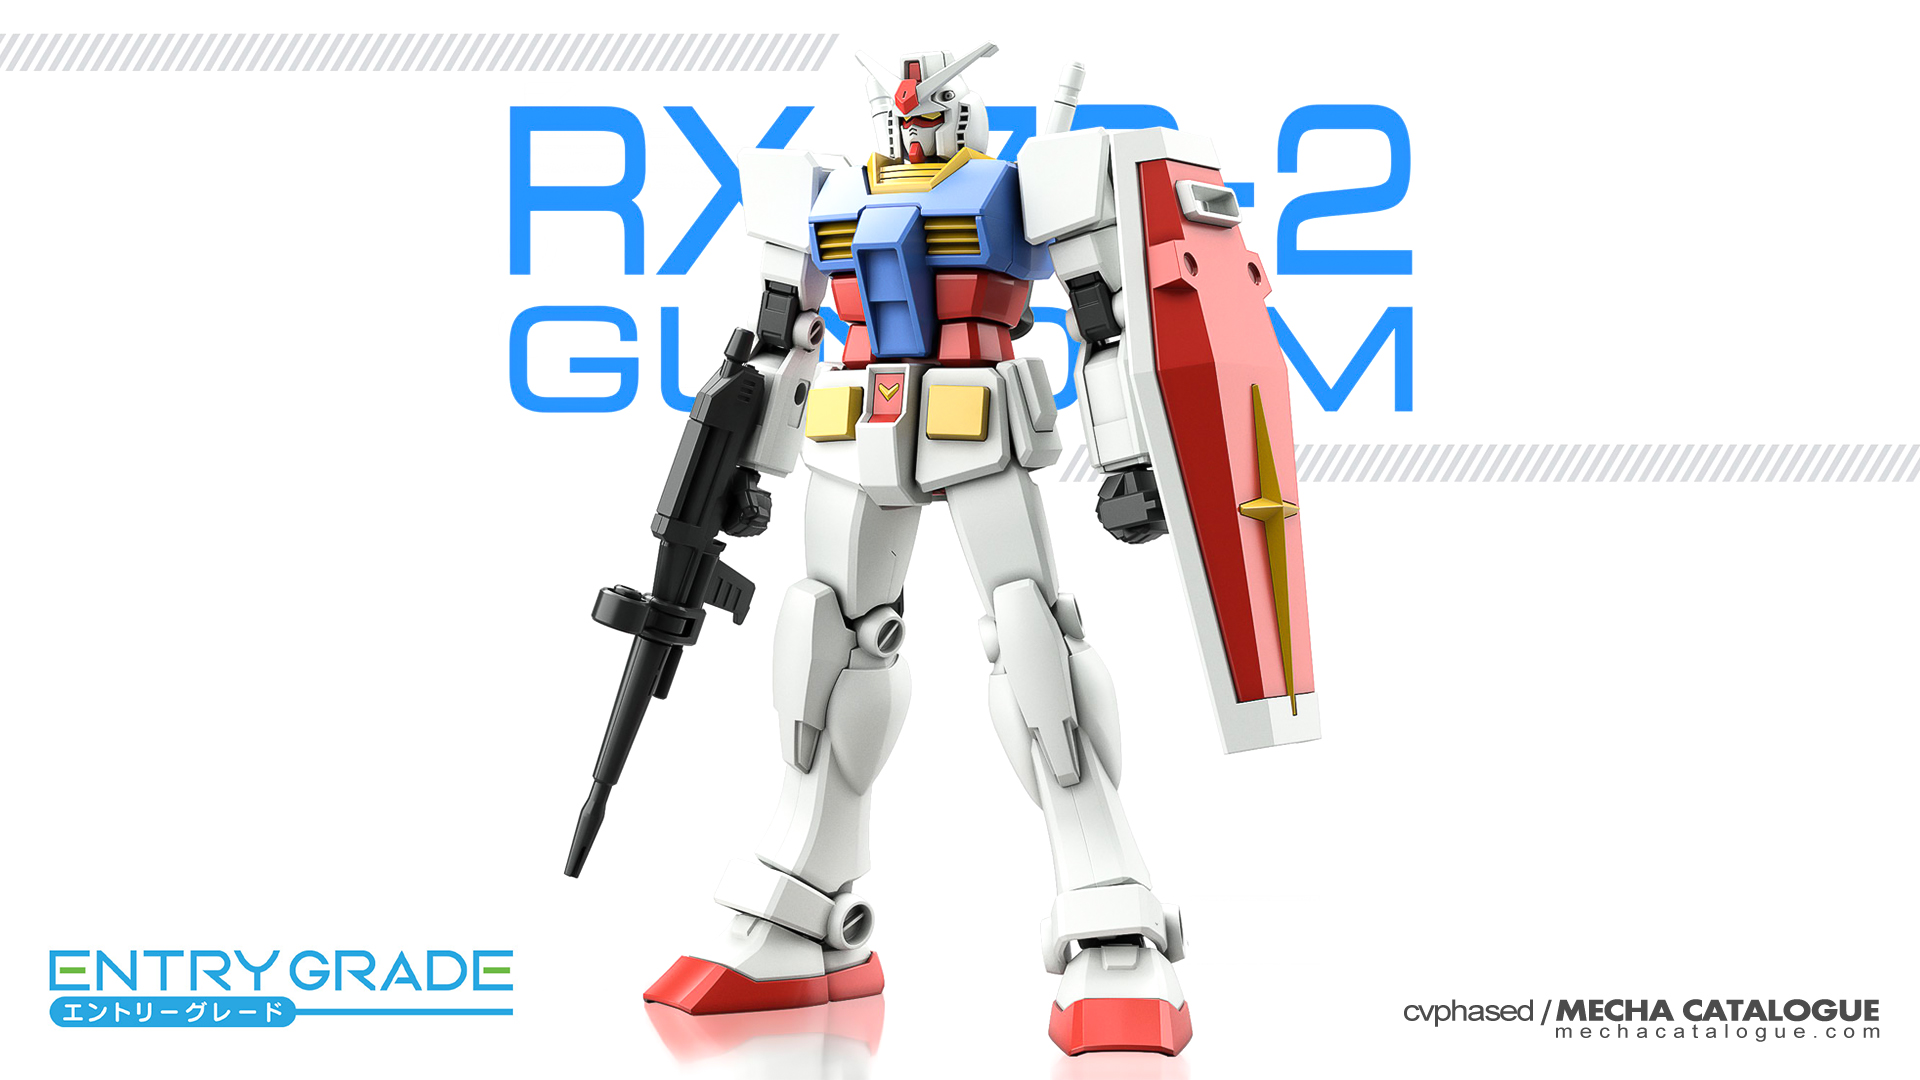 Bandai Spirits' Hobby Next Phase Week: Entry Grade RX-78-2 Gundam